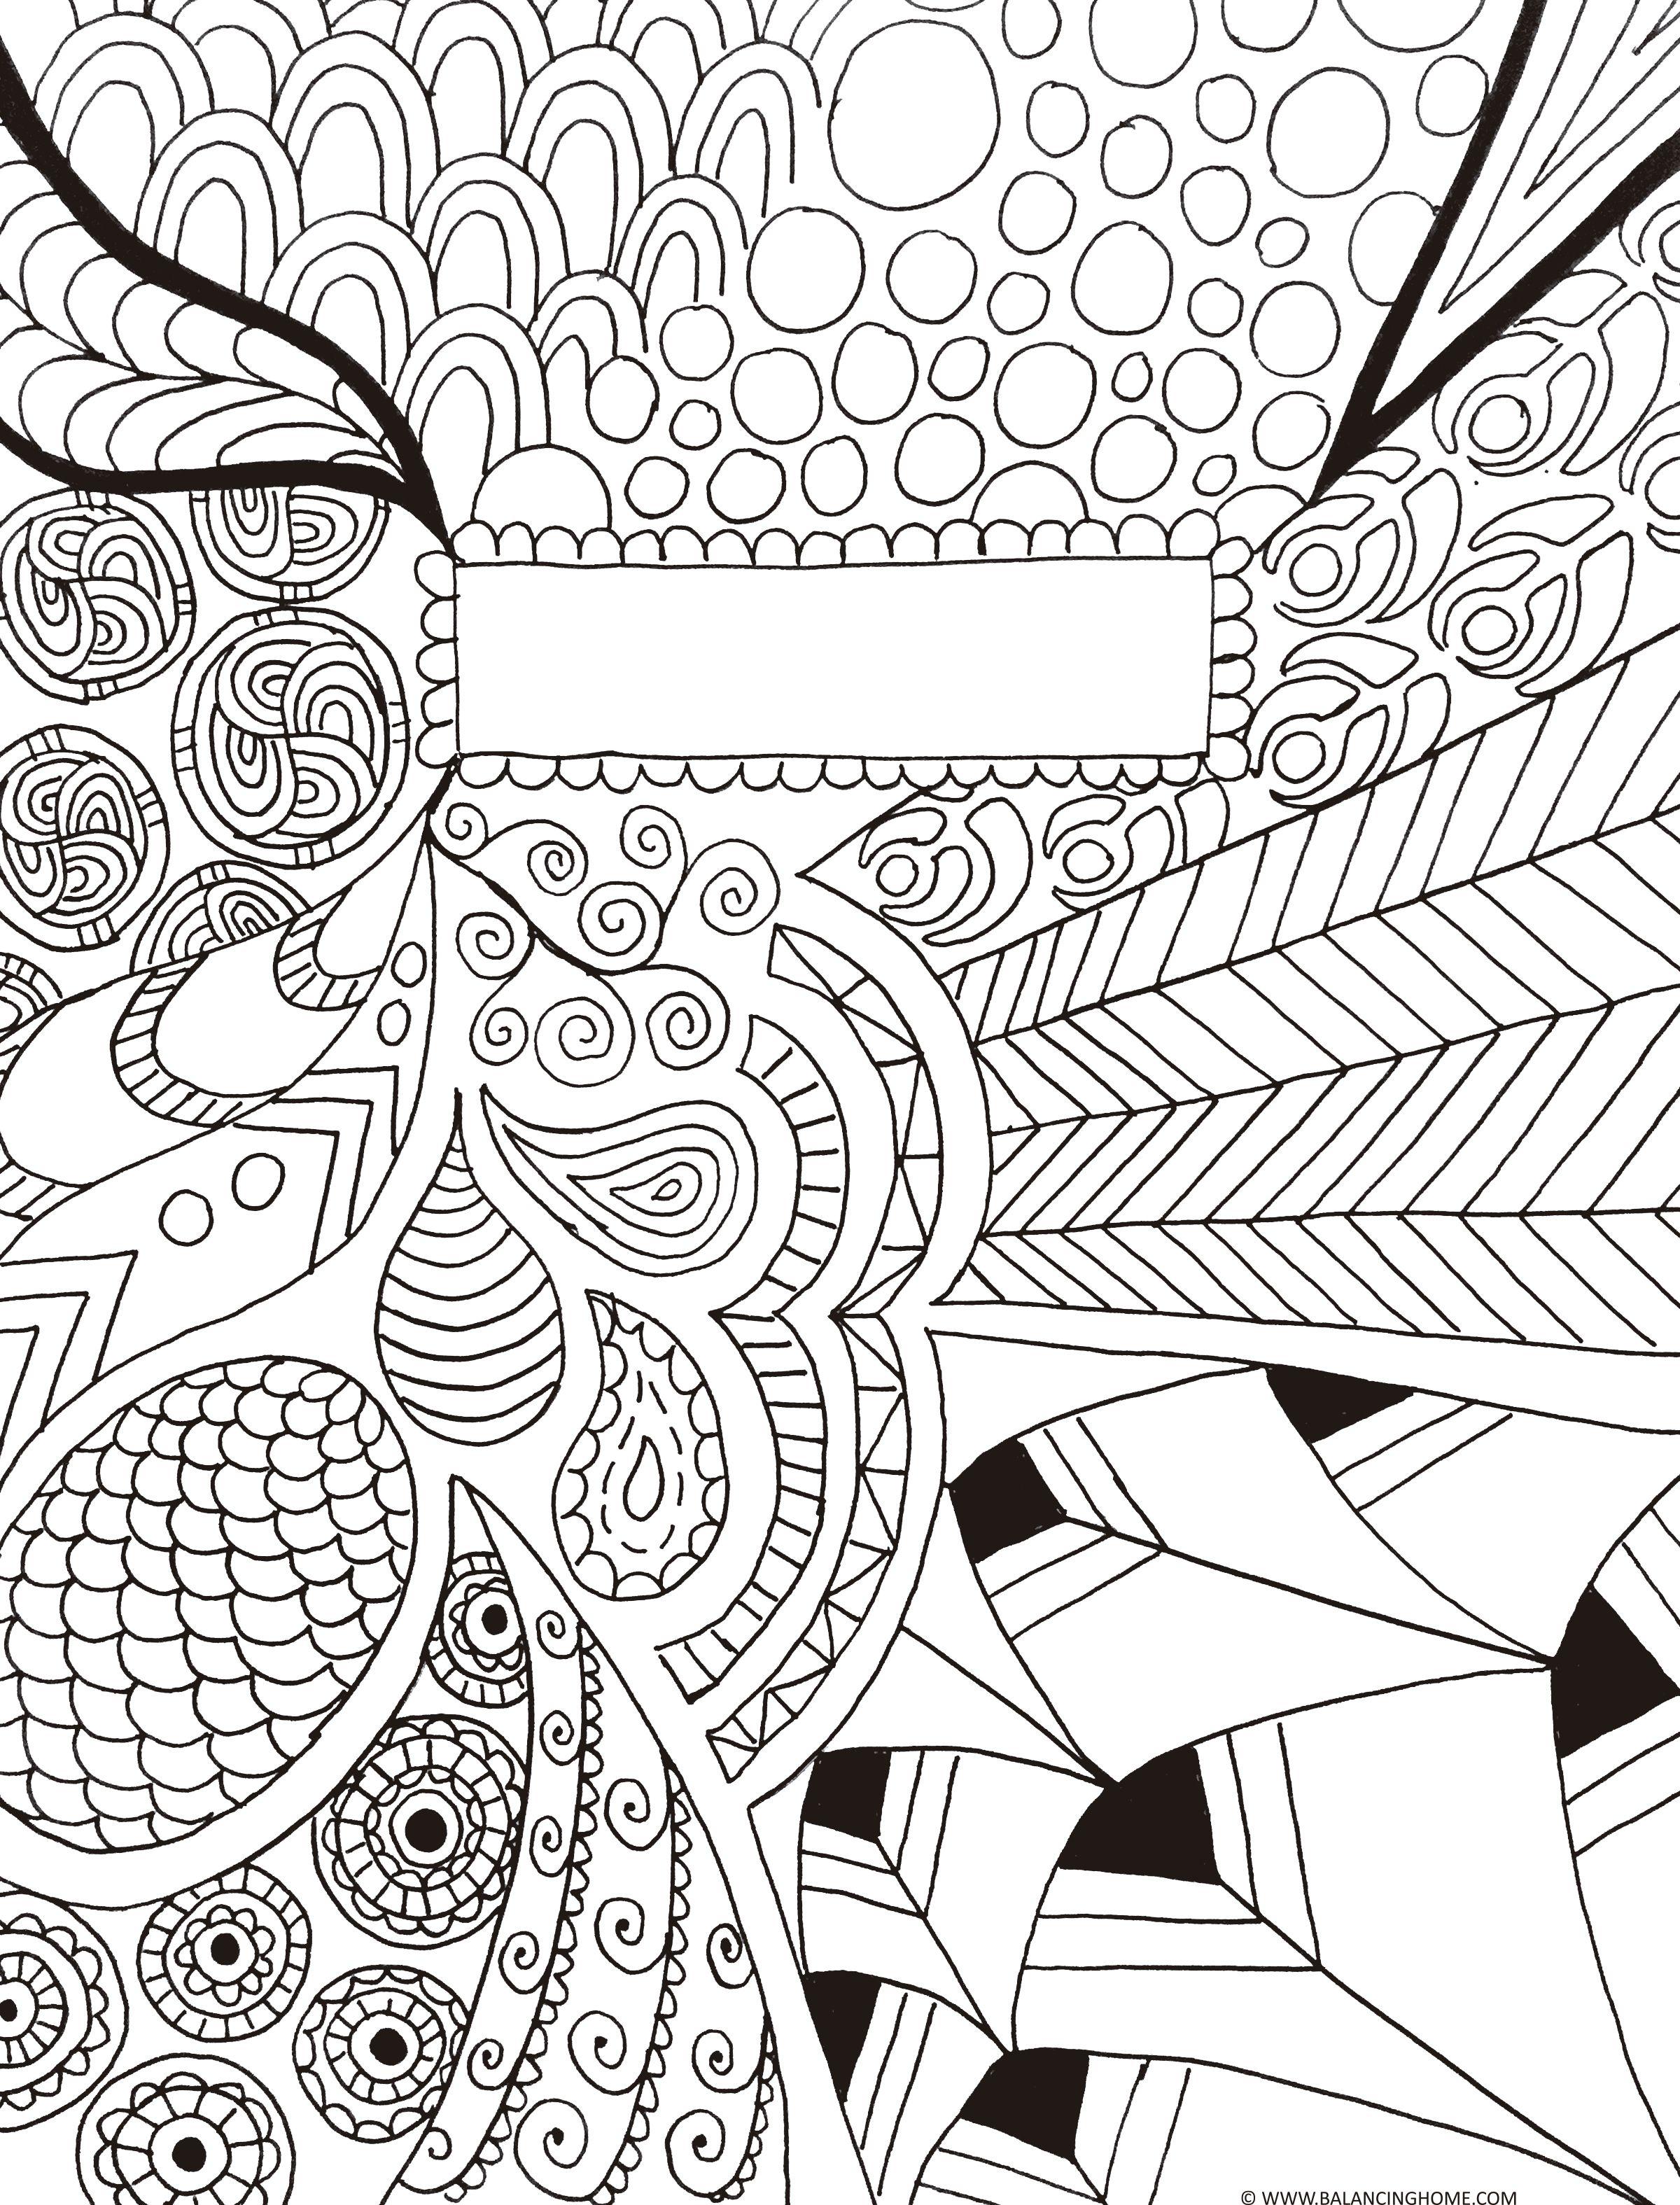 Pinali Mcdonald On Coloring | Pinterest | Binder Covers, Binder - Free Printable Binder Covers To Color